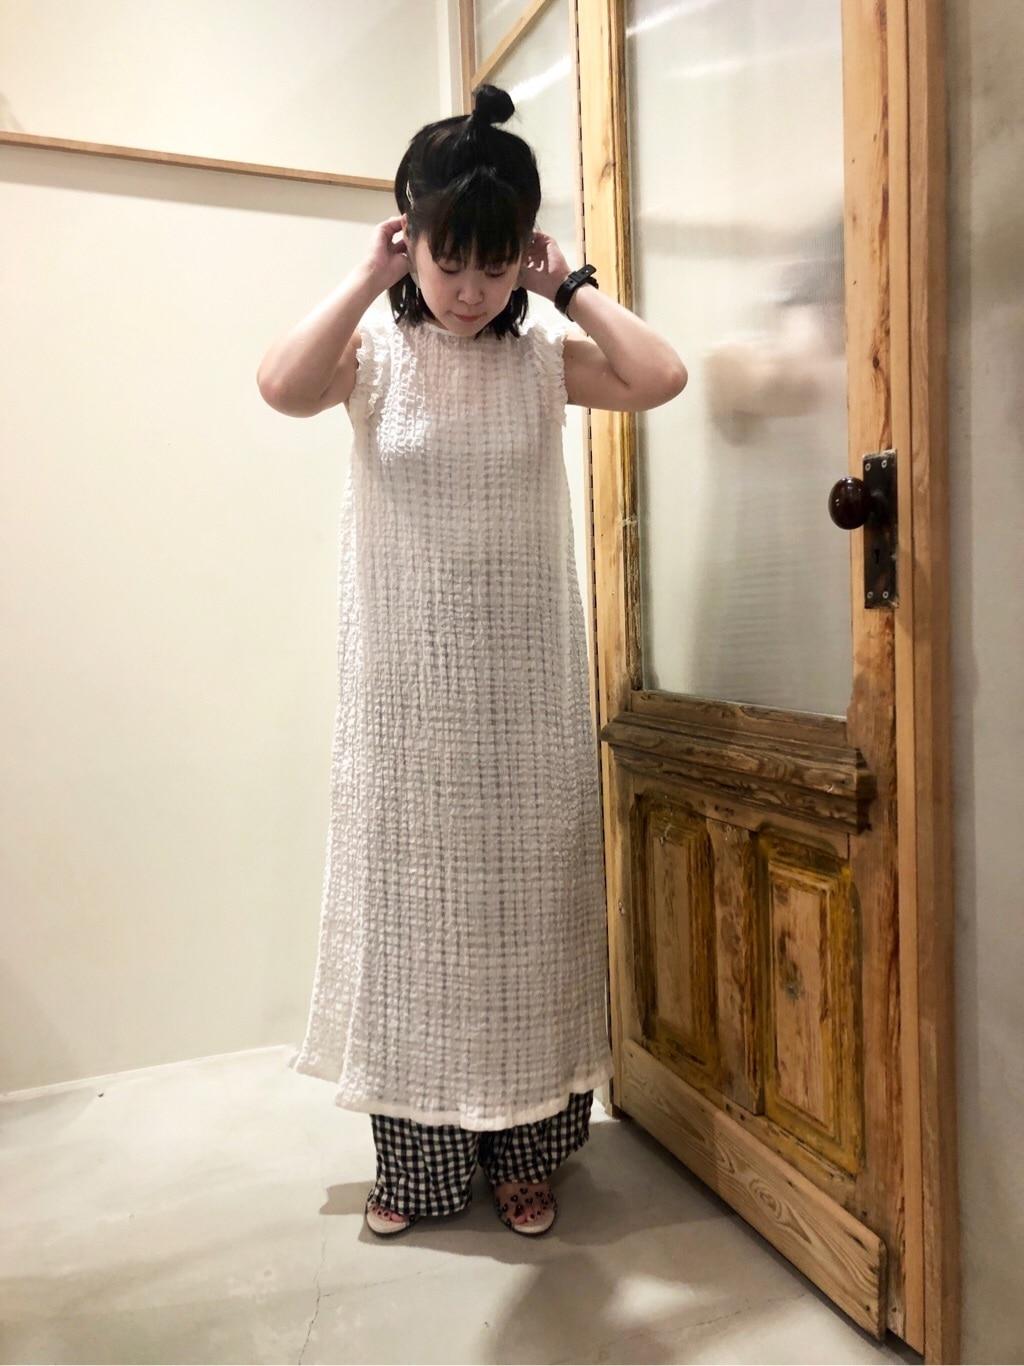 bulle de savon 渋谷スクランブルスクエア 身長:157cm 2020.06.23